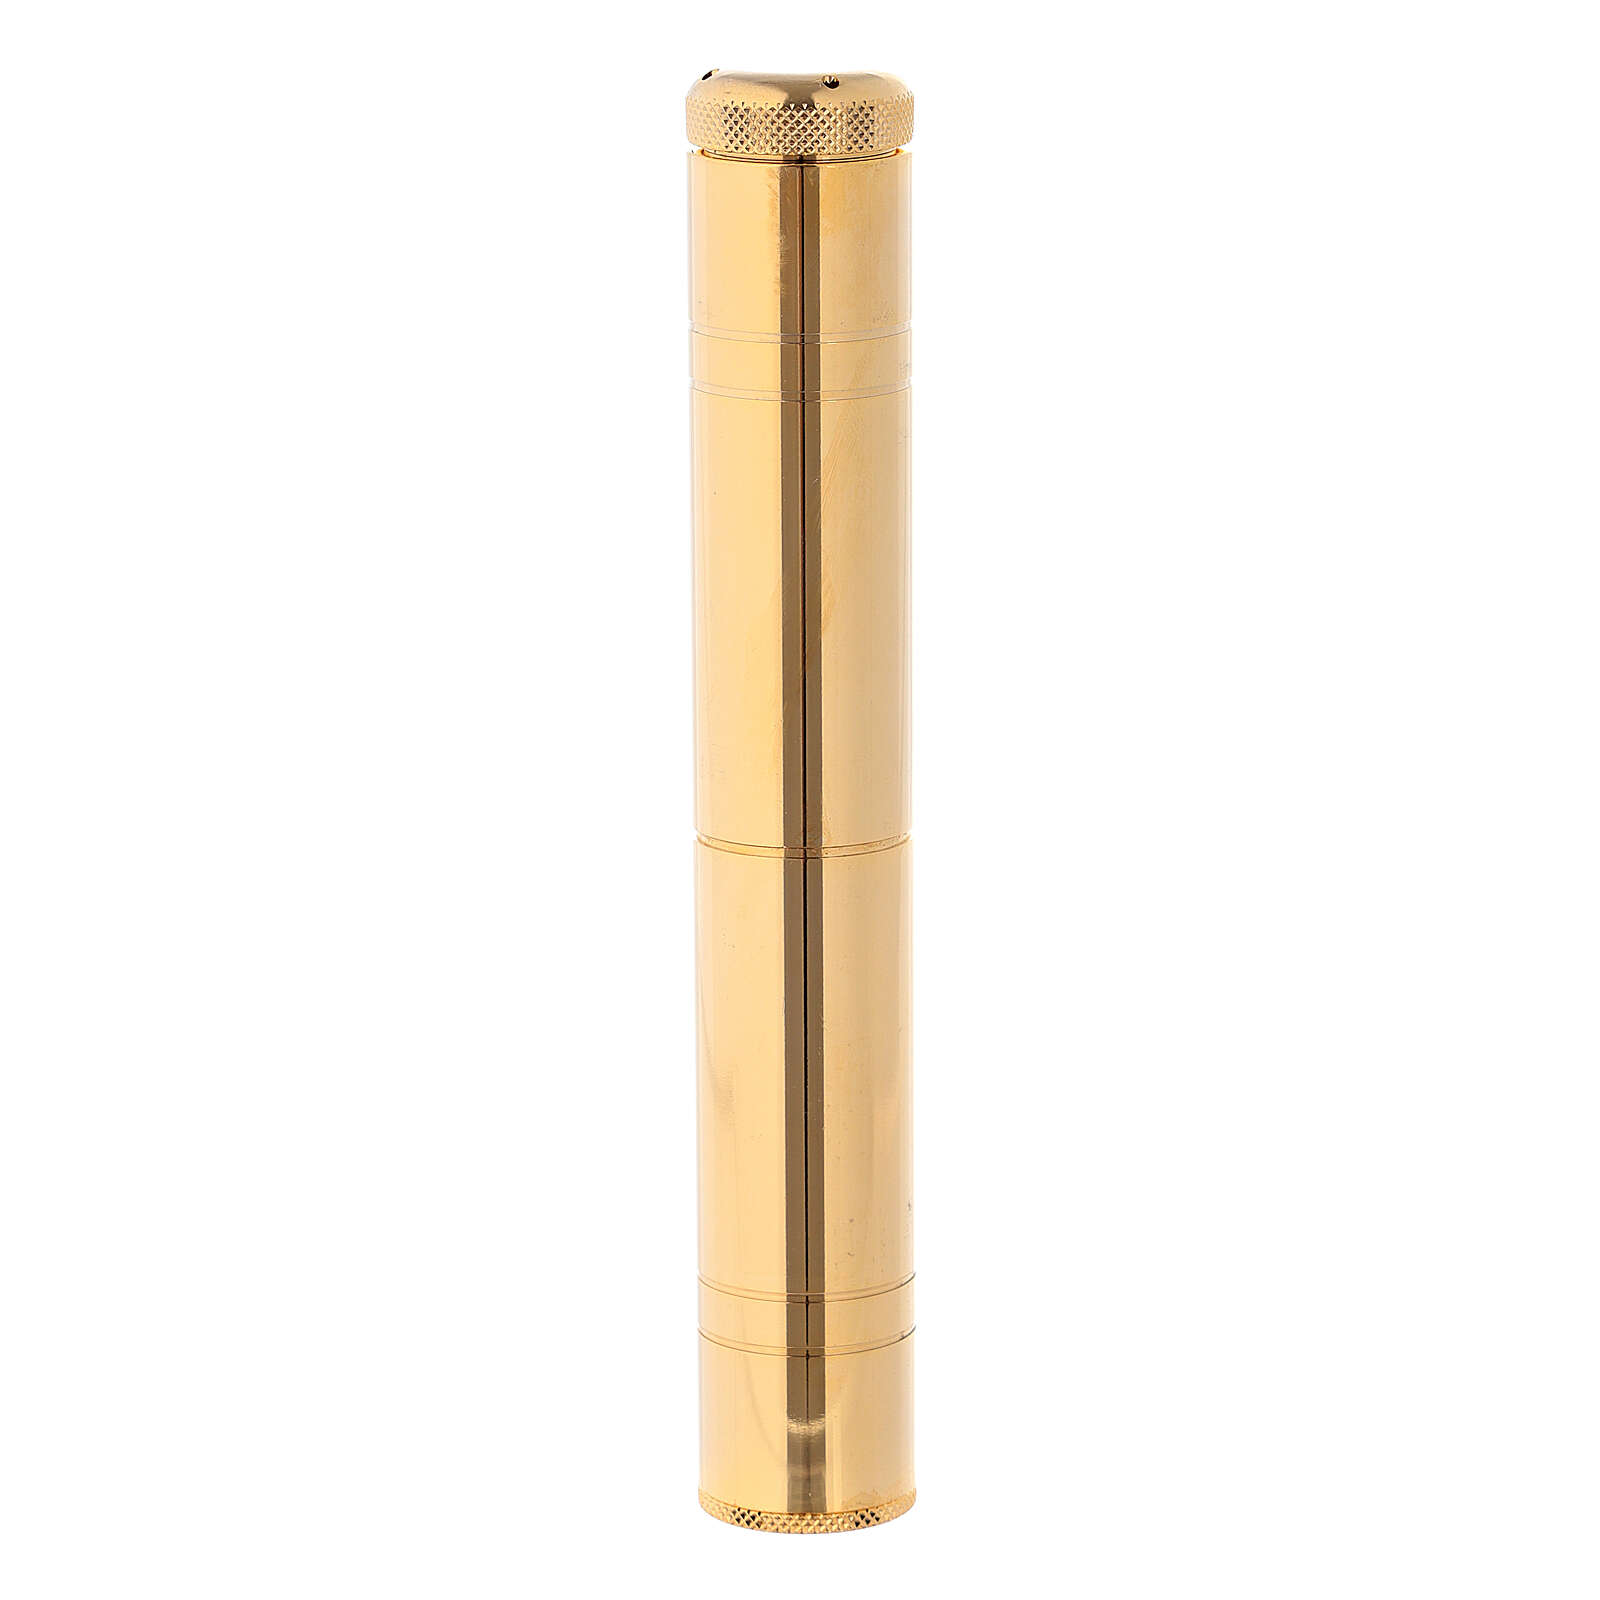 Aspergillum 16 cm in golden brass with case 3